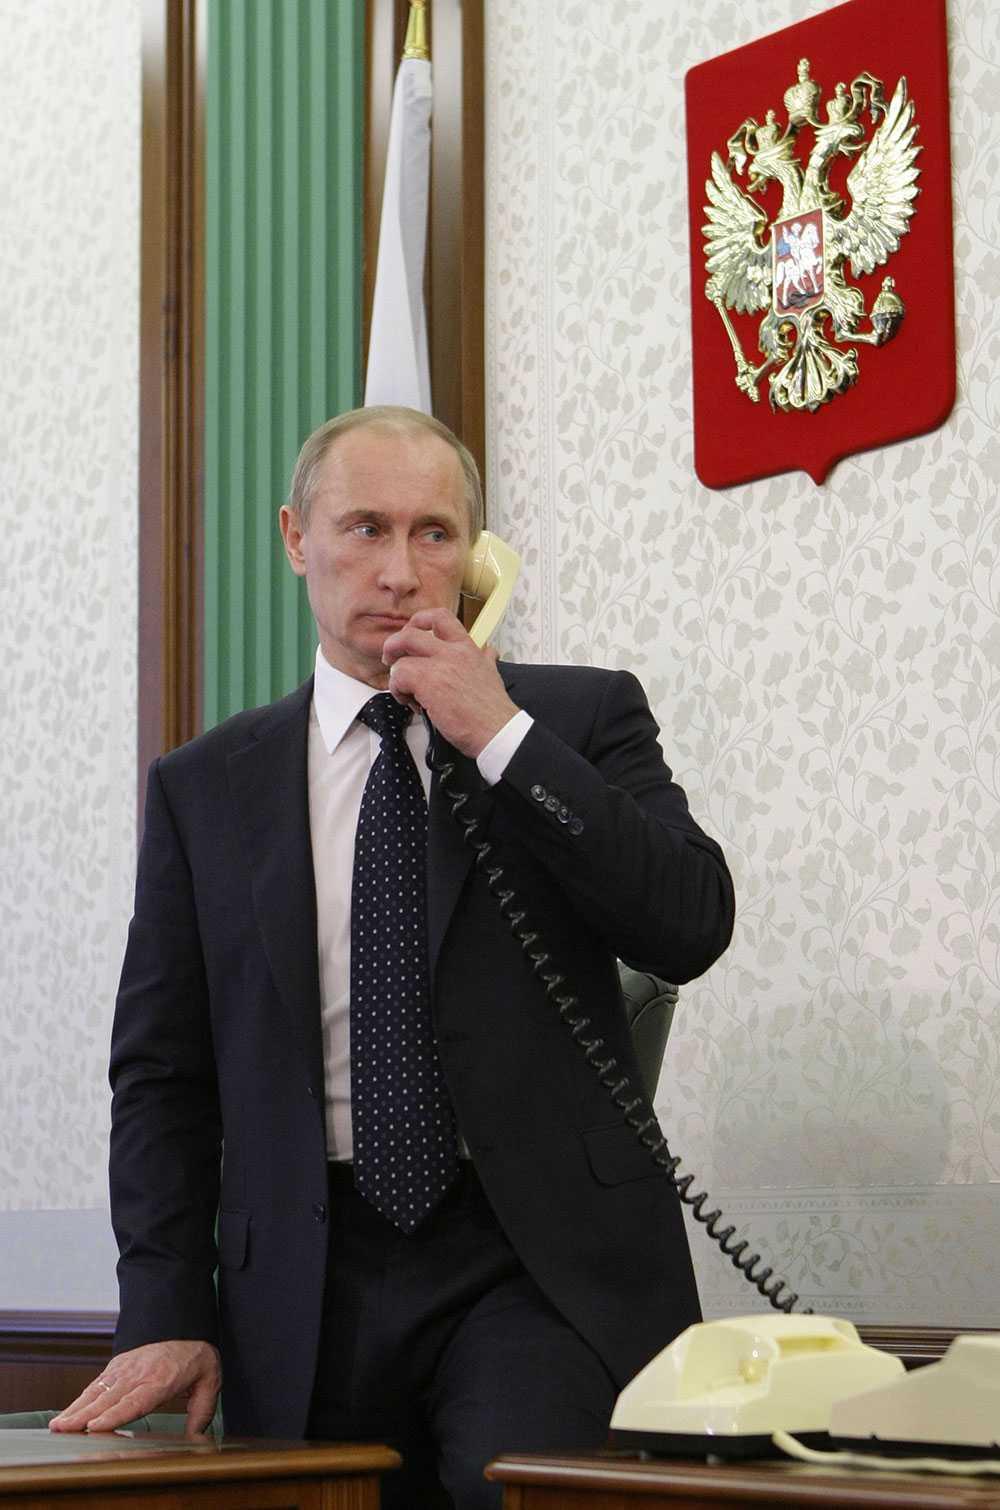 Putin pratar i telefon vid ett tidigare tillfälle.